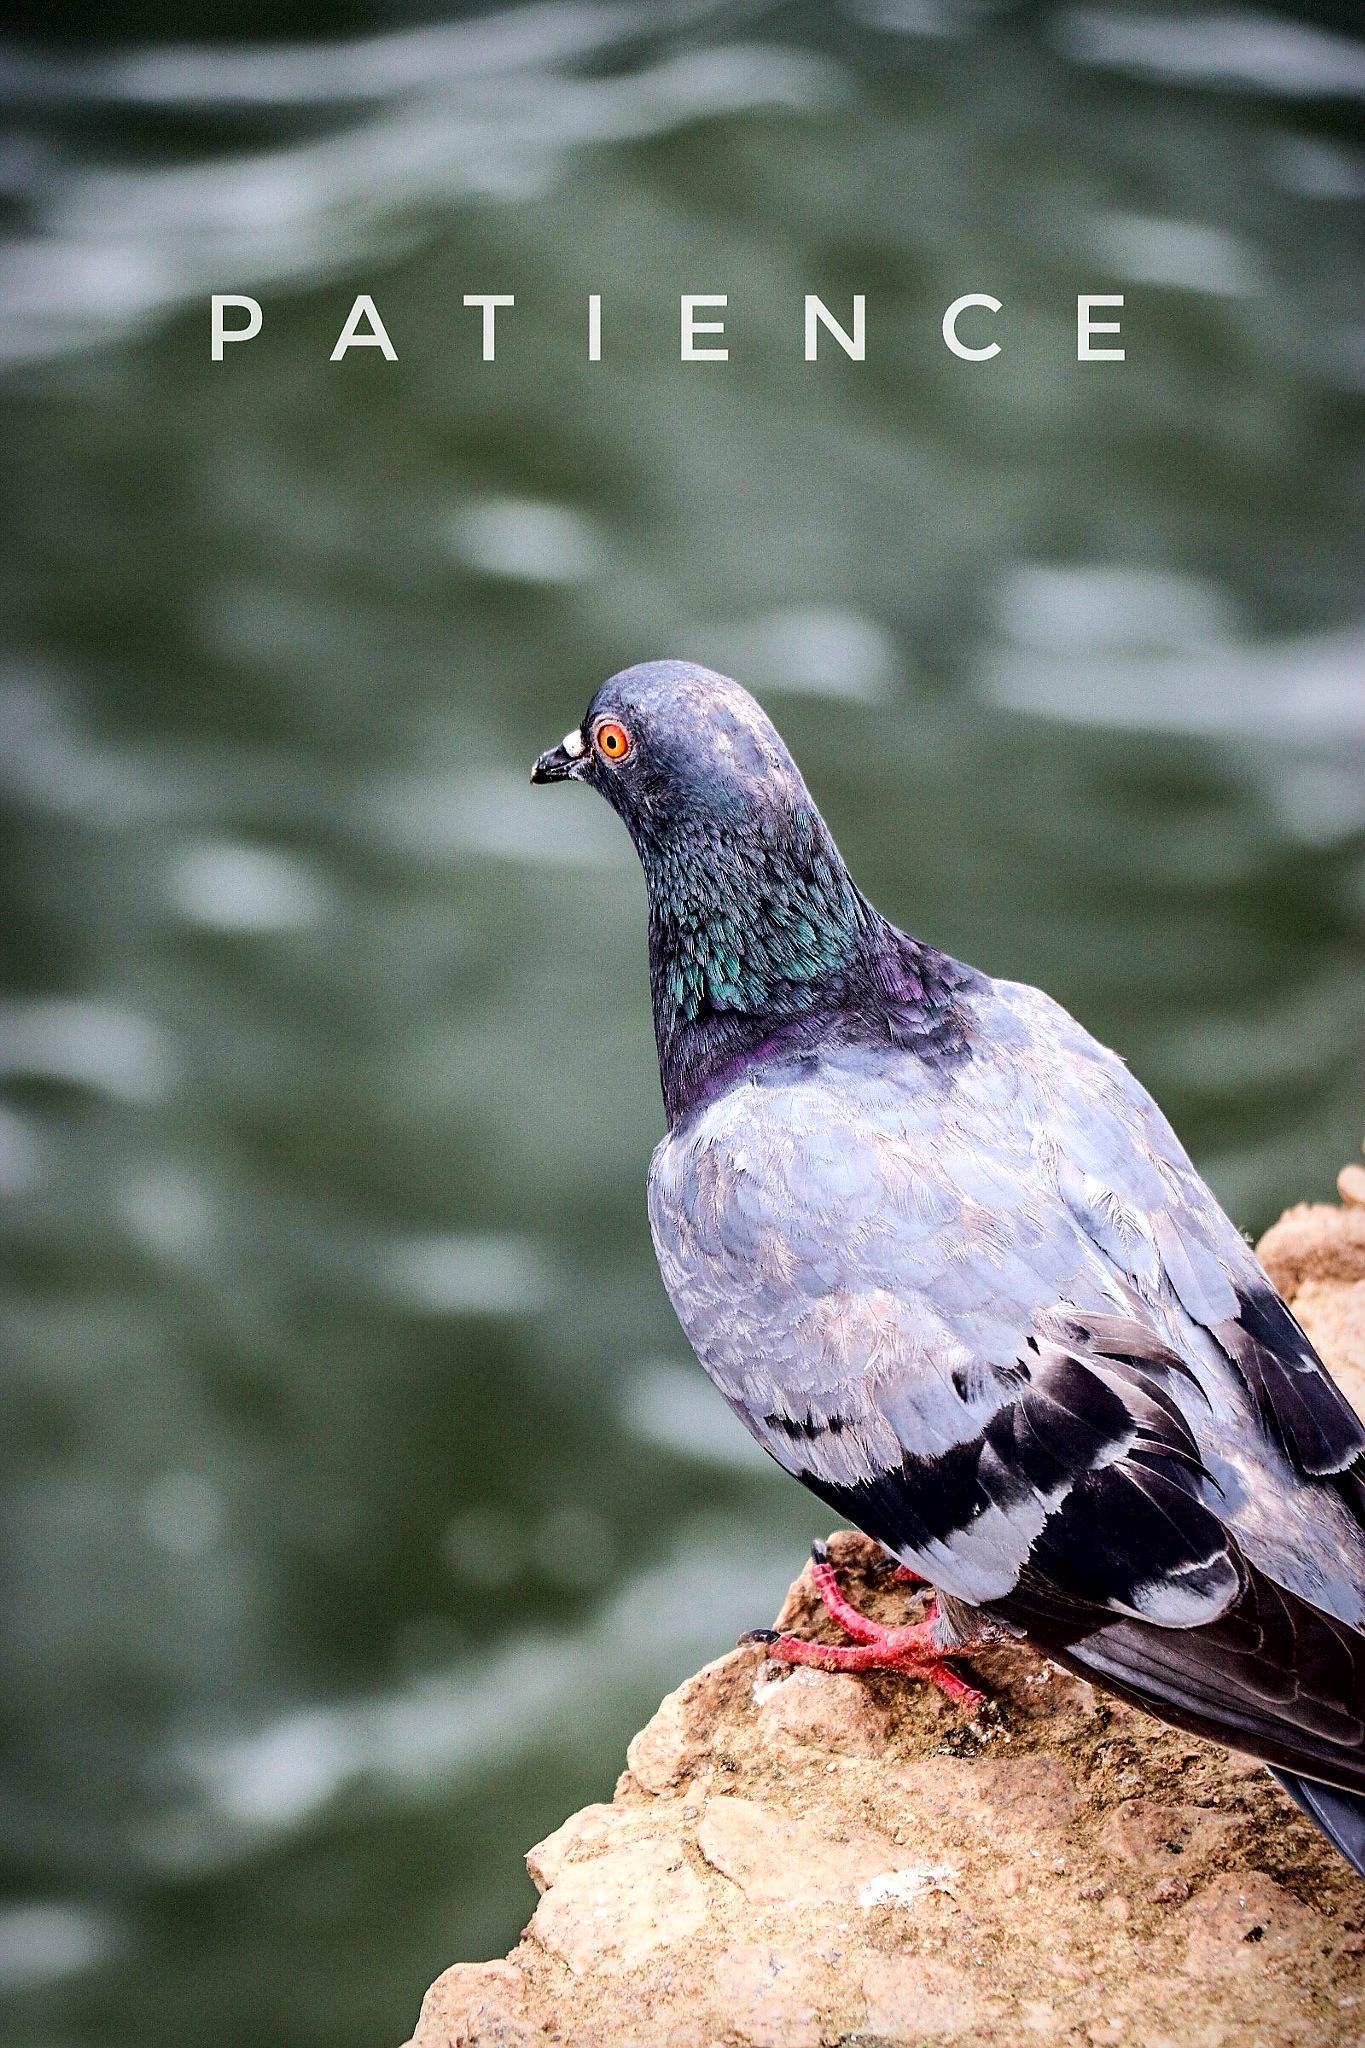 Patience by Adarsh Prasad